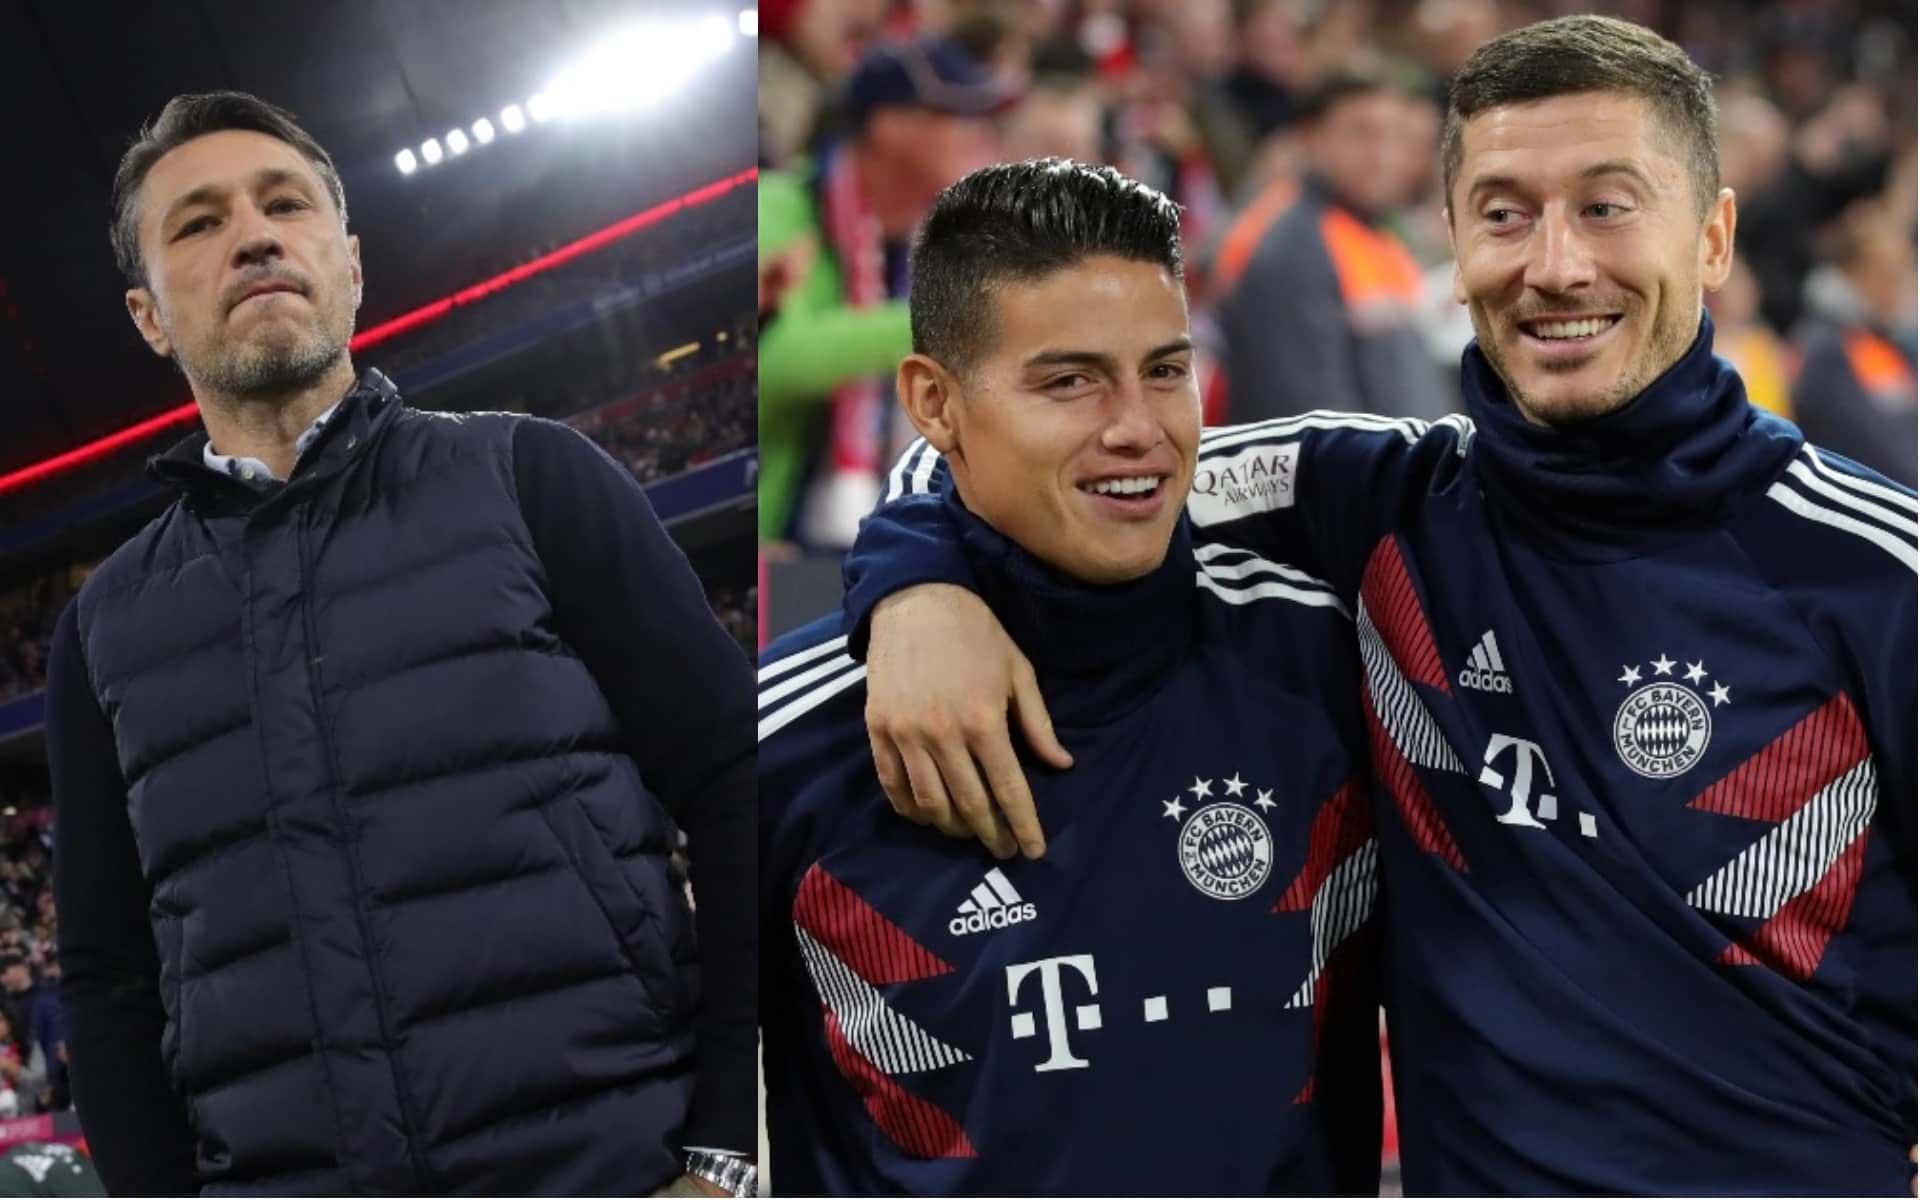 Video: Sin James Rodríguez empató Bayern München VS Augsburg en la Fecha 5 de Bundesliga 2018/19